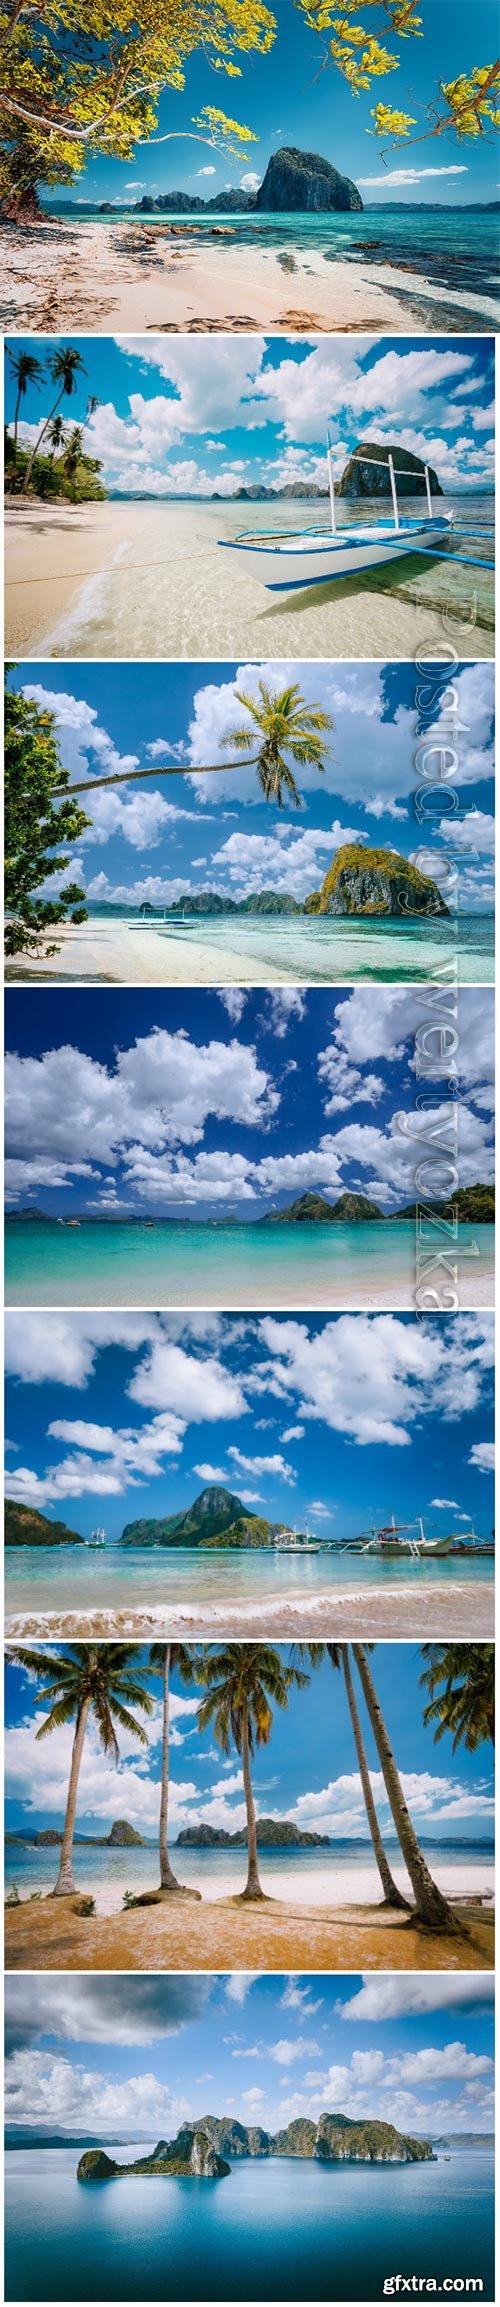 Beautiful landscape beach paradise